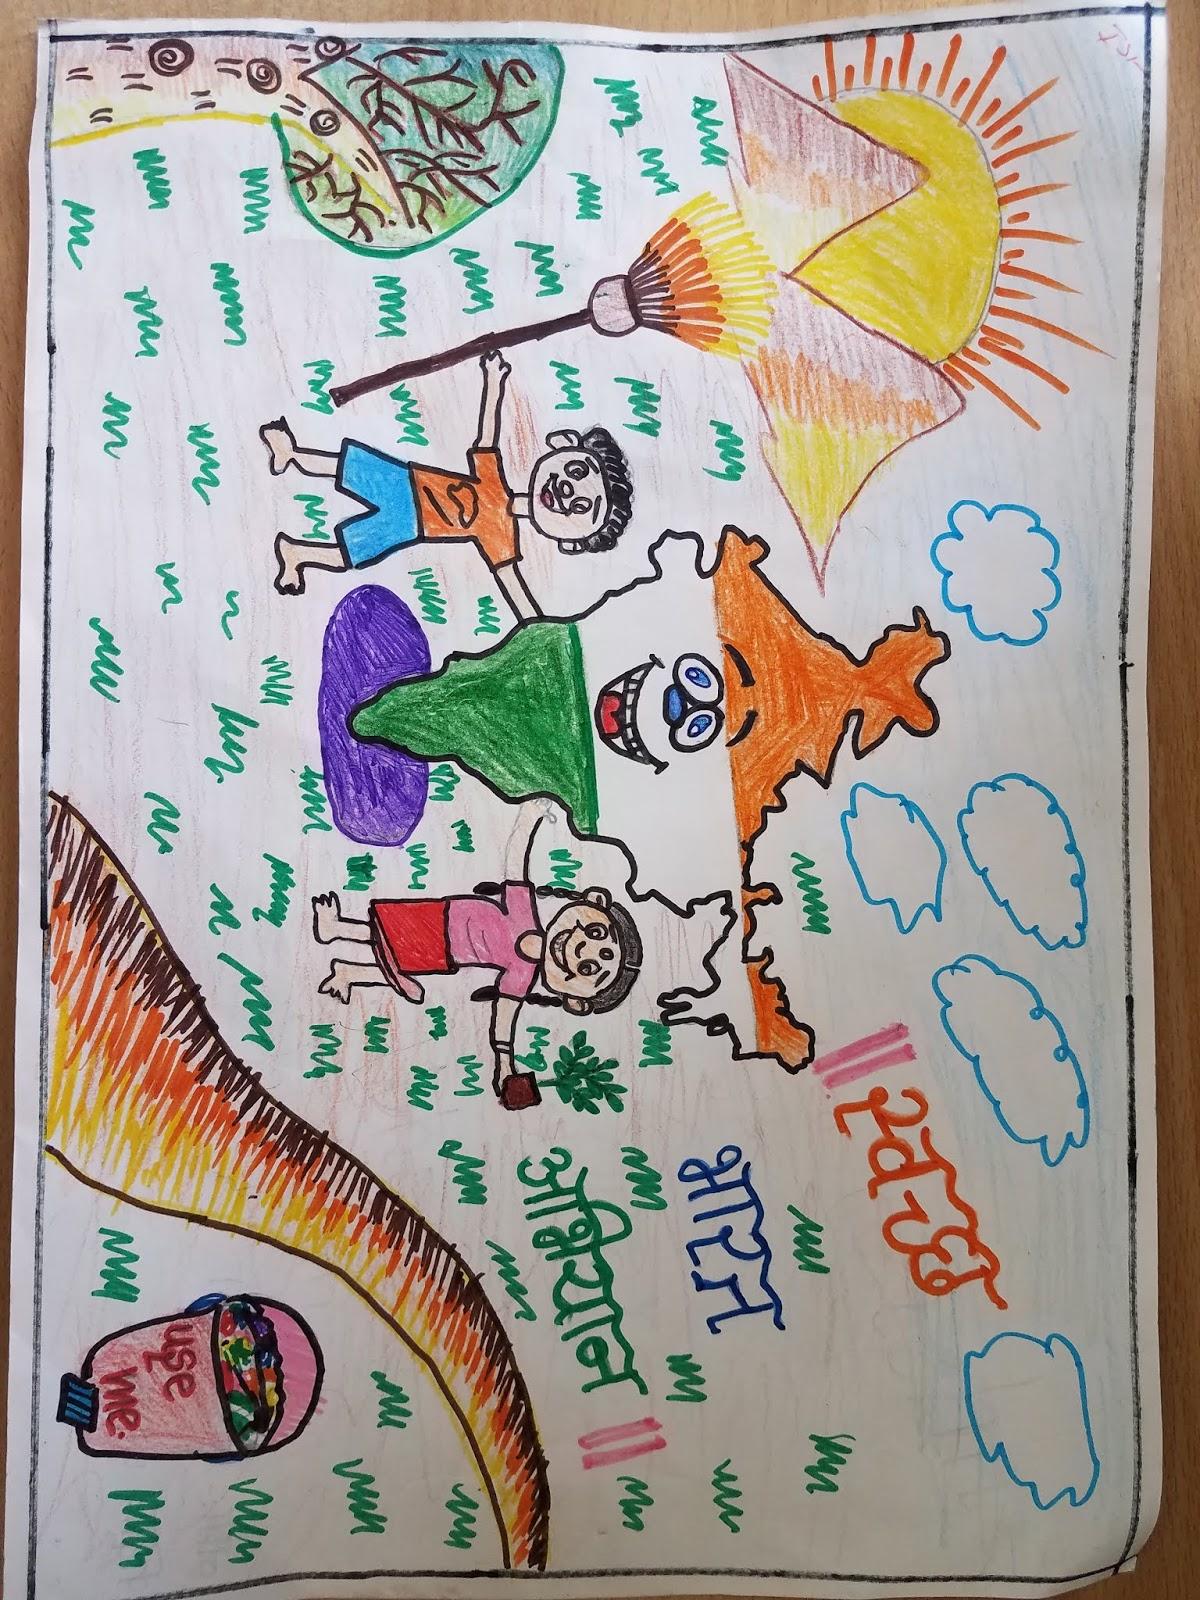 Kendriya Vidyalaya No 2 Afs Pune Primary Section